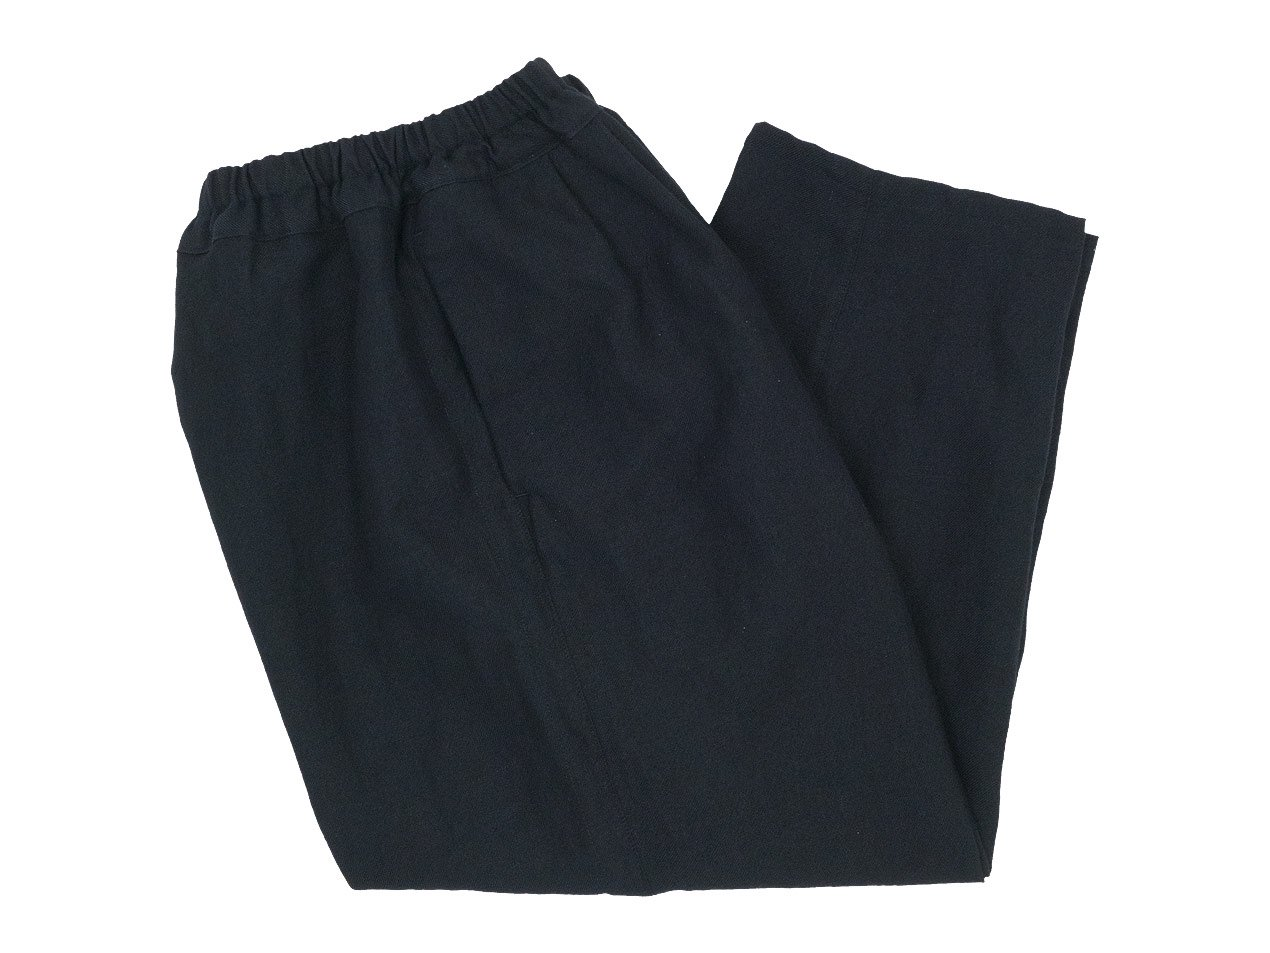 ordinary fits NARROW BALL PANTS WOOL LINEN BLACK